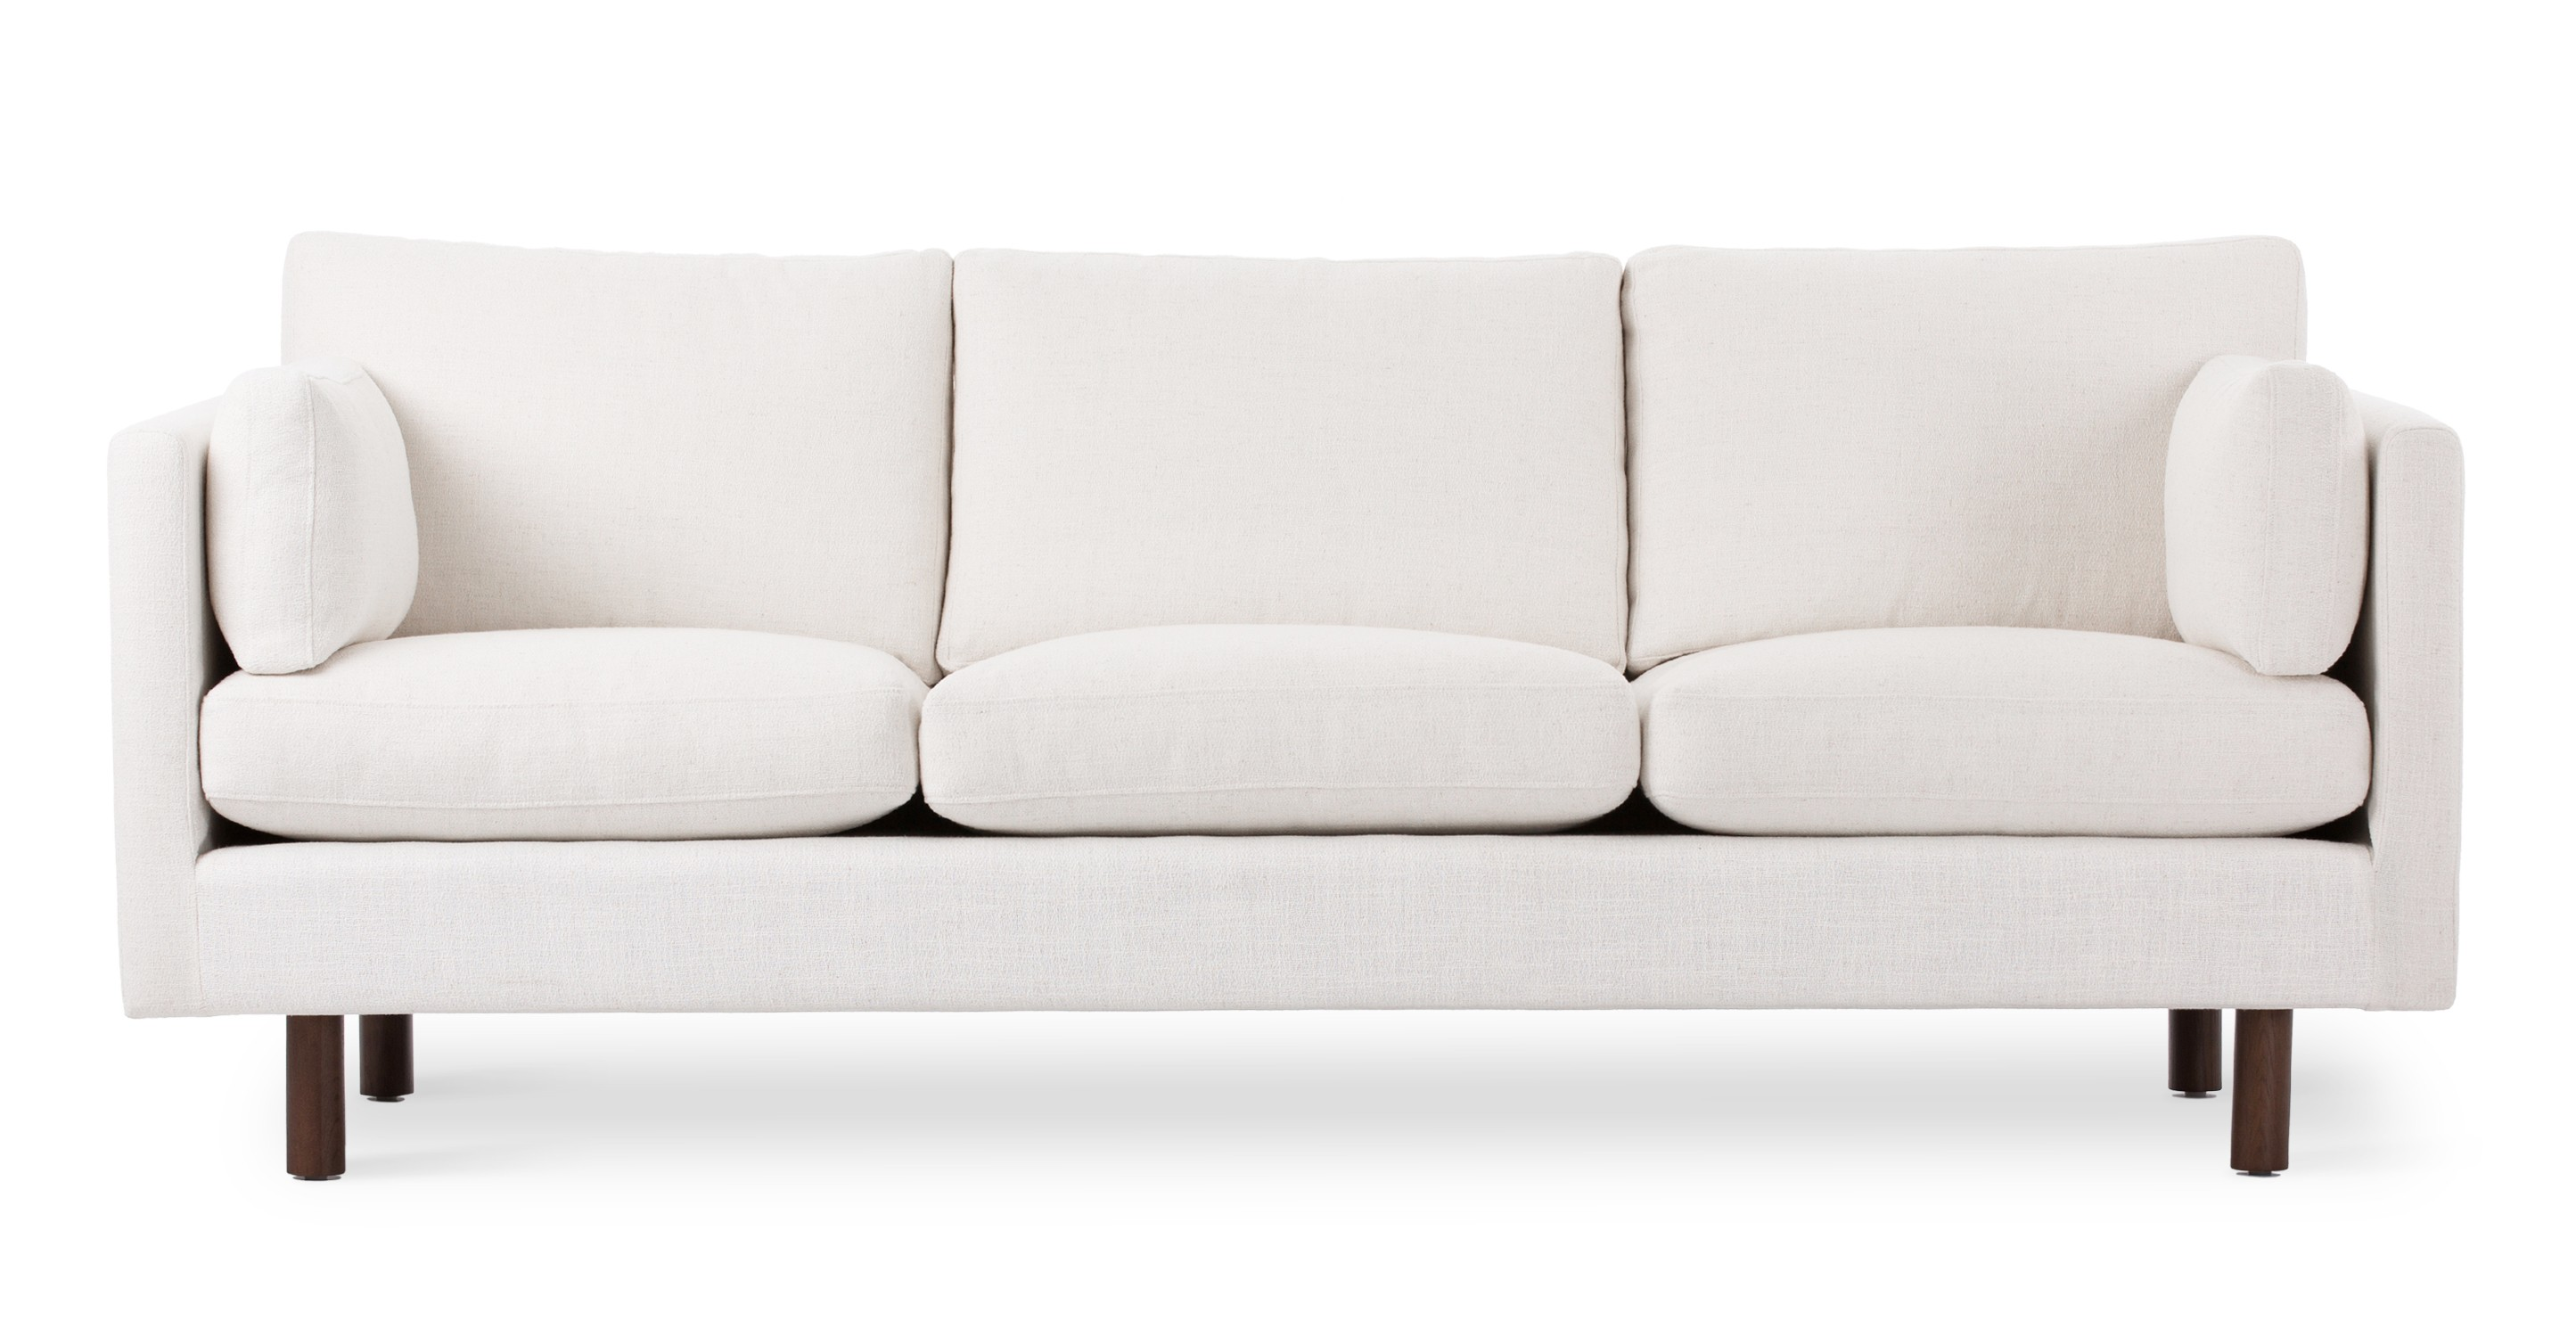 stain proof sofa fabric dog bed saver nova creamy white - sofas article | modern, mid ...